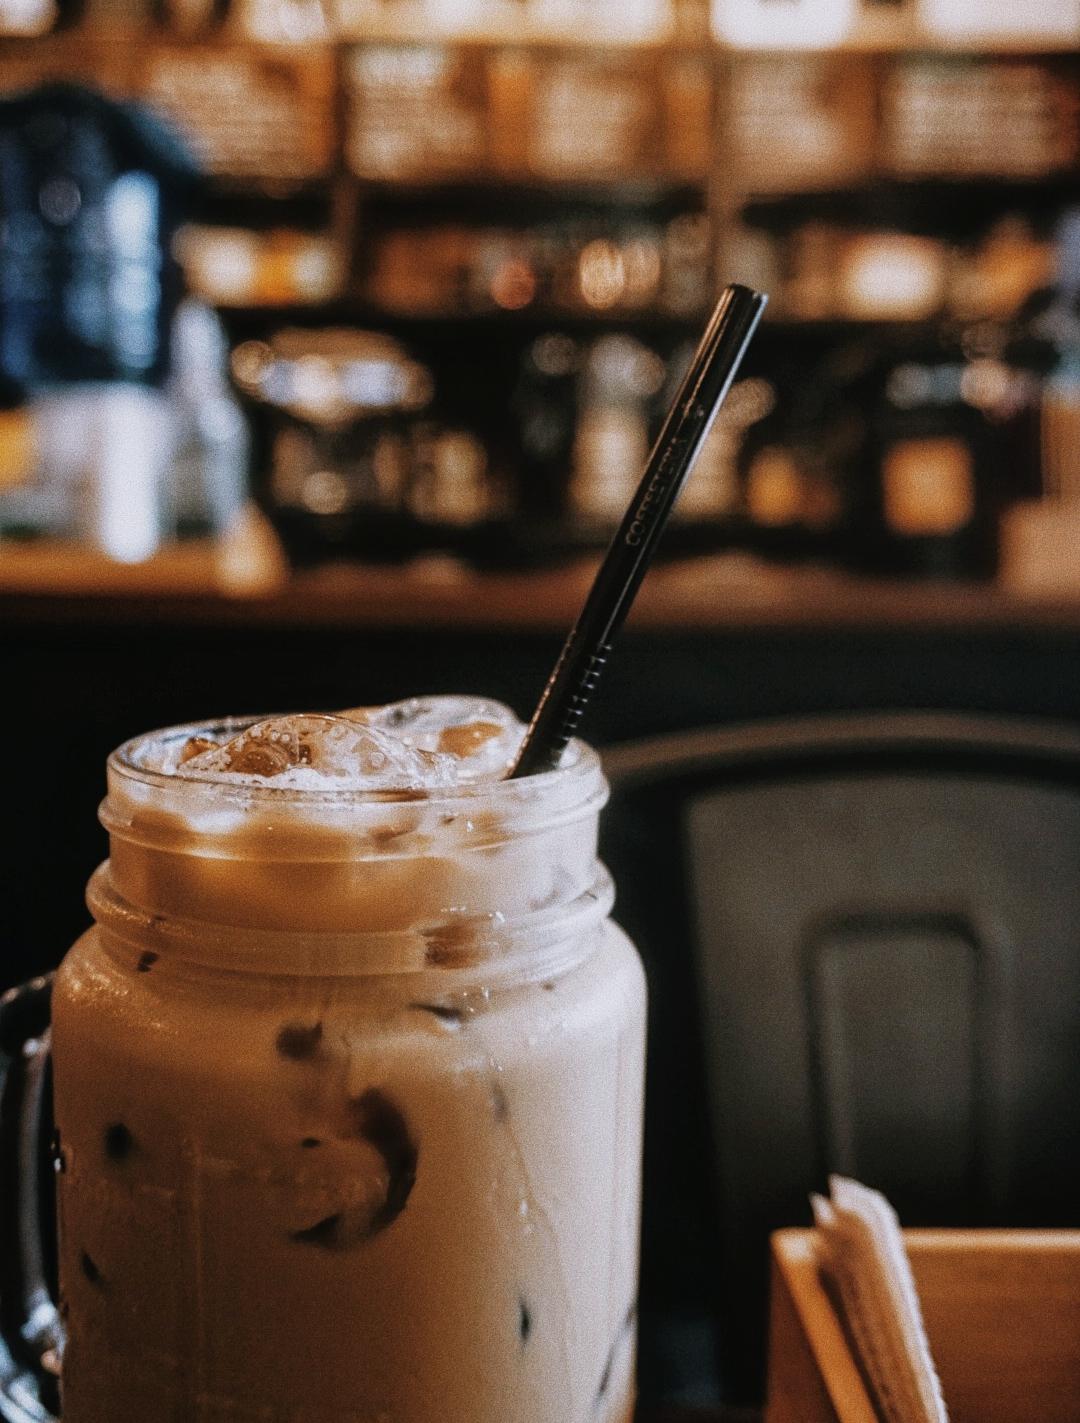 BLOGGERS-CEBU-ALMOSTABLOGGER-COFFEETERIA-COFFEESHOPS.jpg